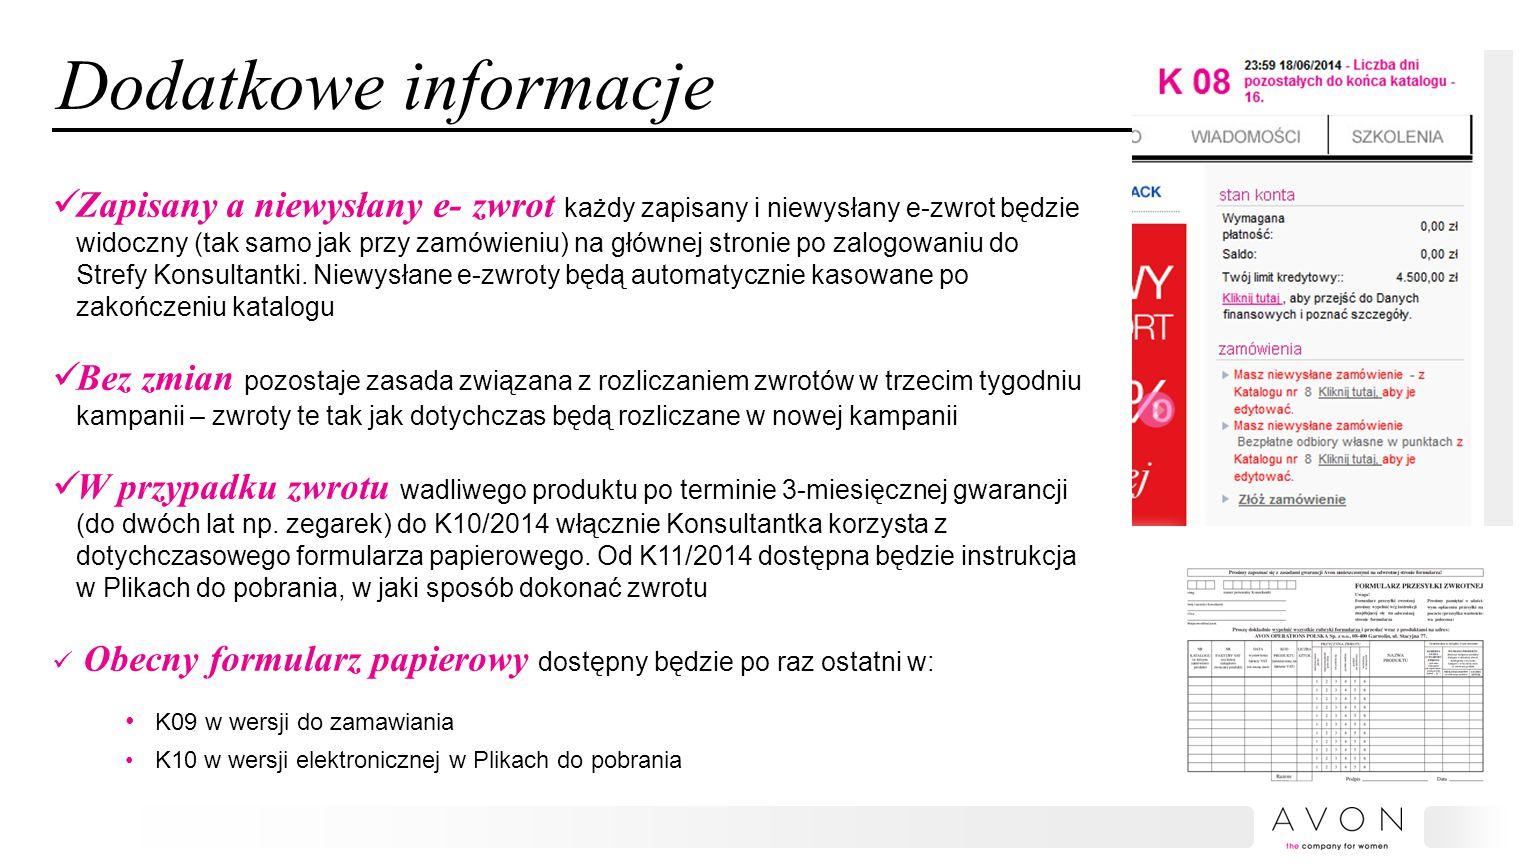 Avon 2014 Corporate Template